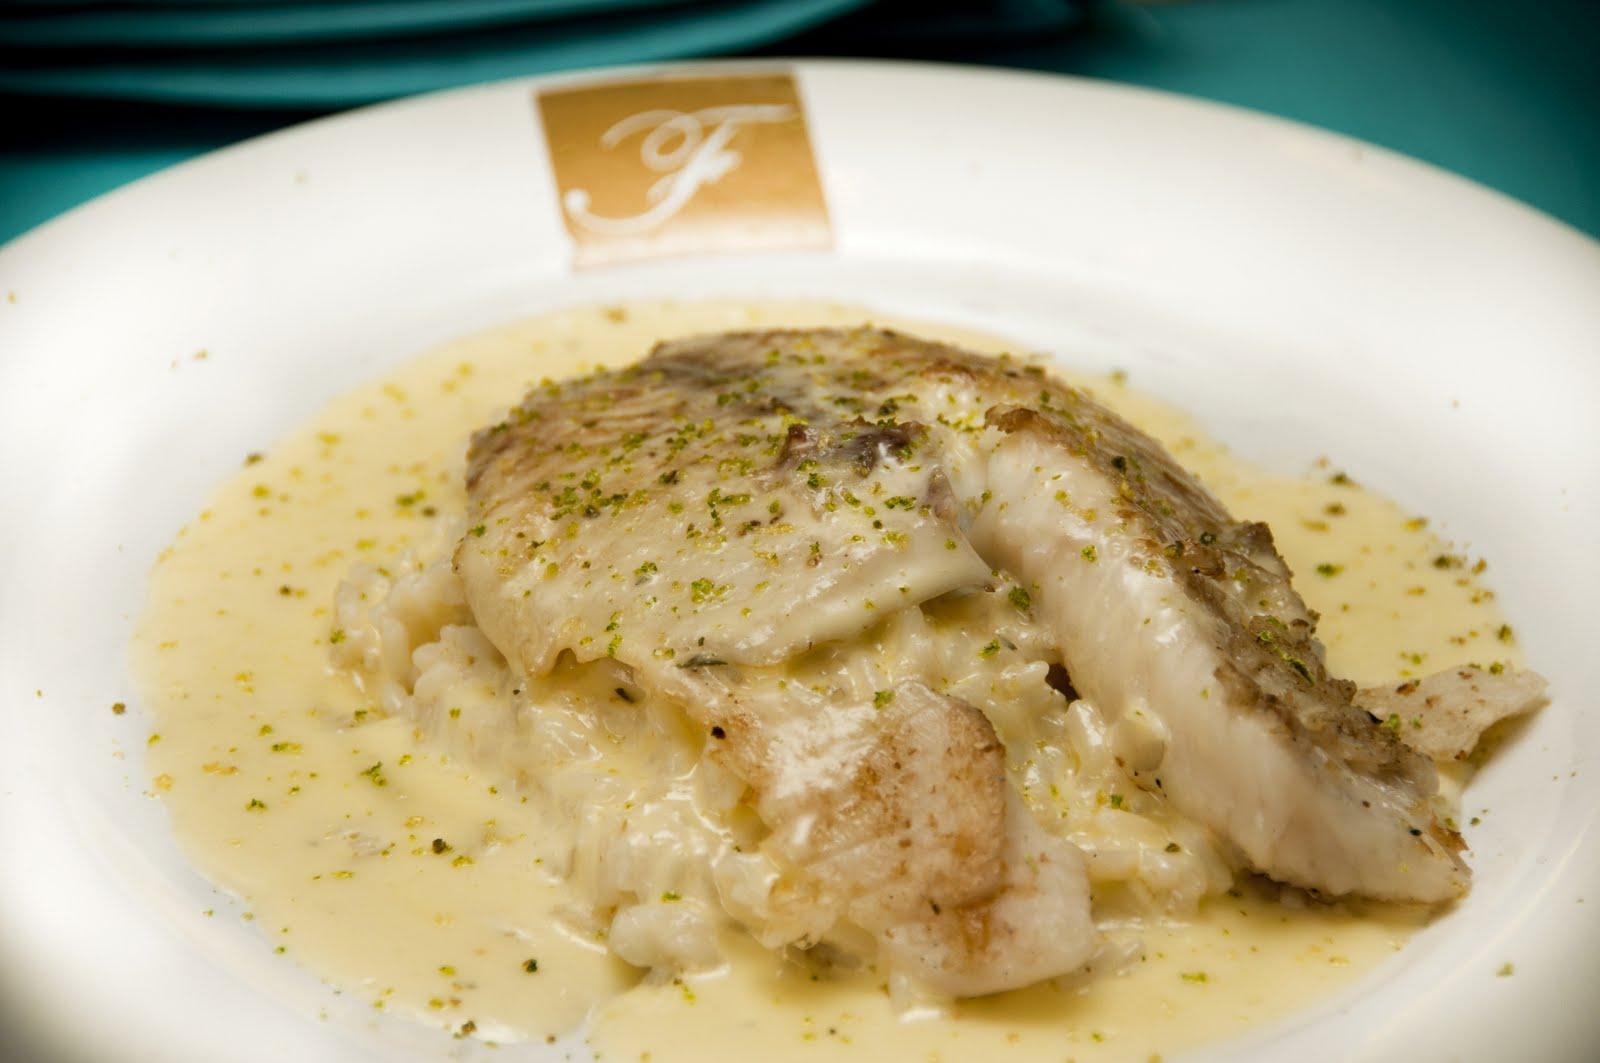 FIORELLA FINE DINING GOURMET RESTAURANT IN MCALLEN DINING OUT